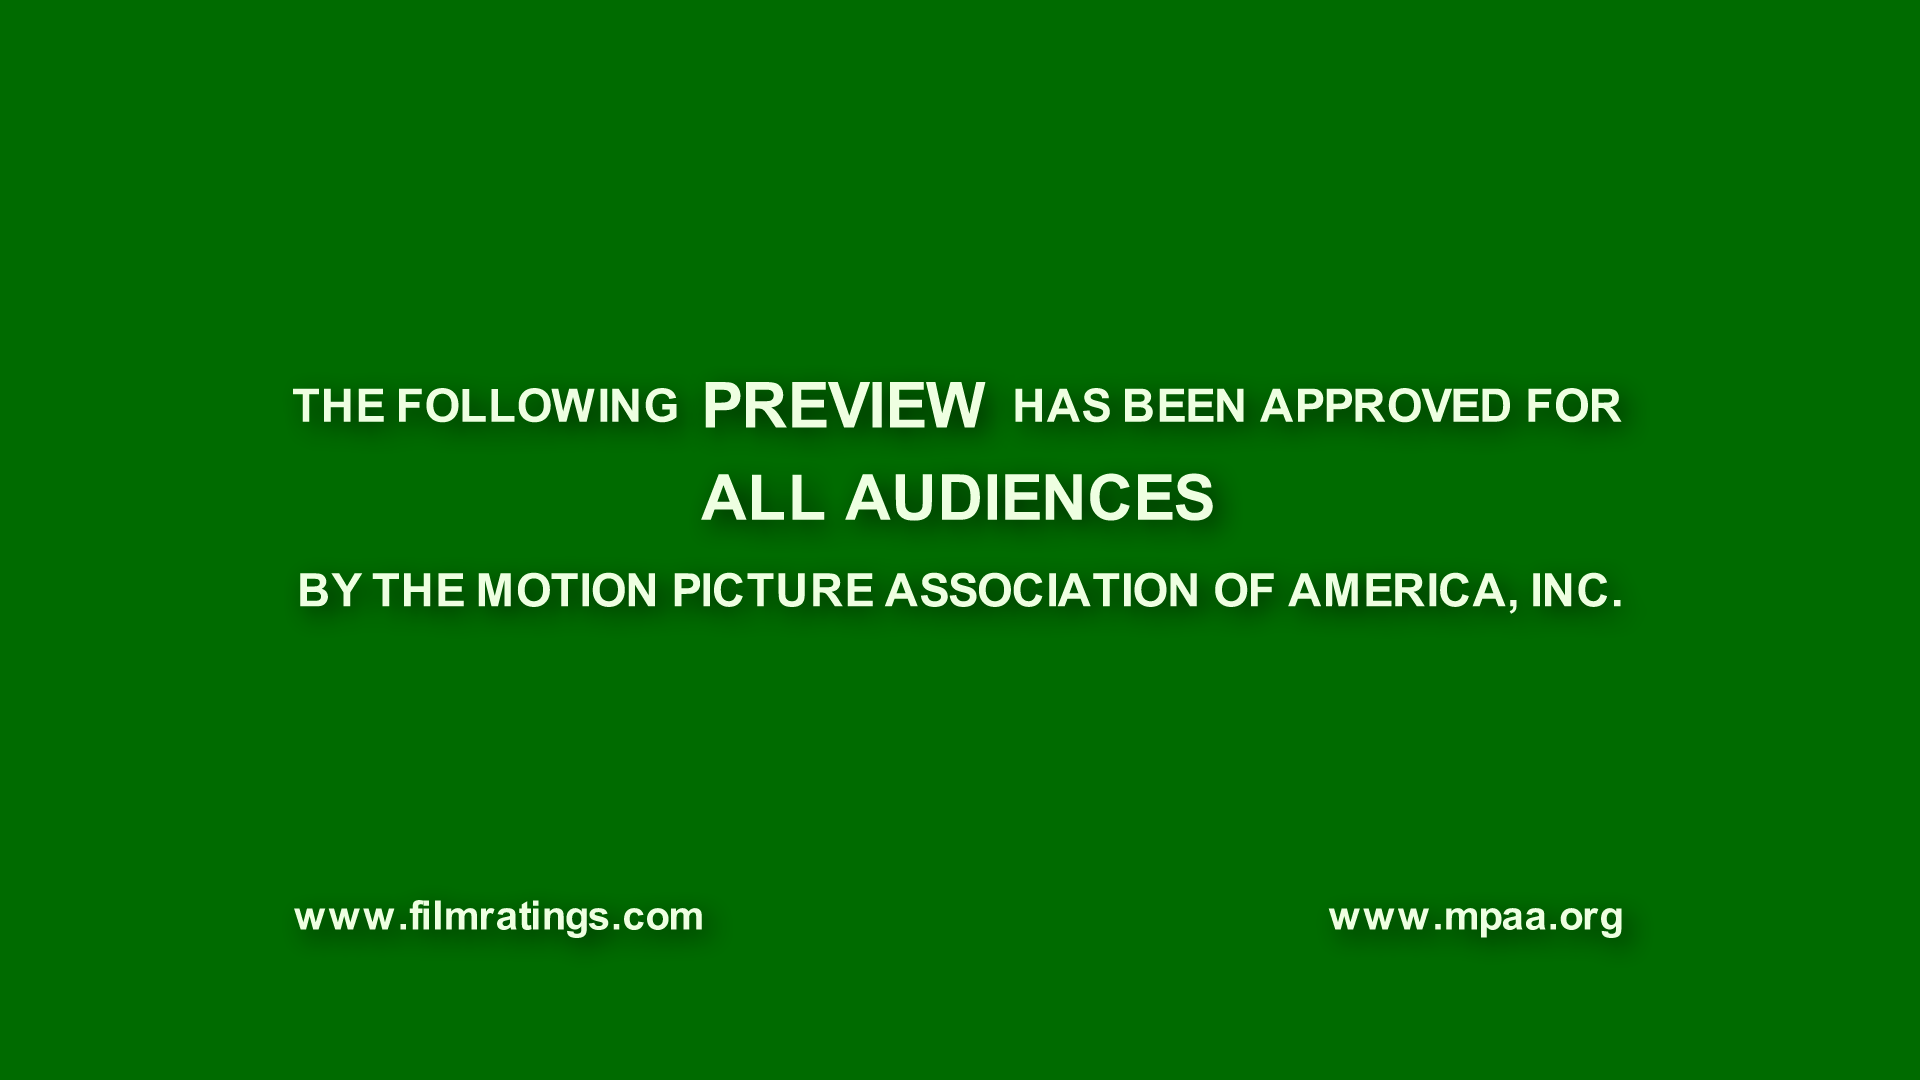 trailer-image